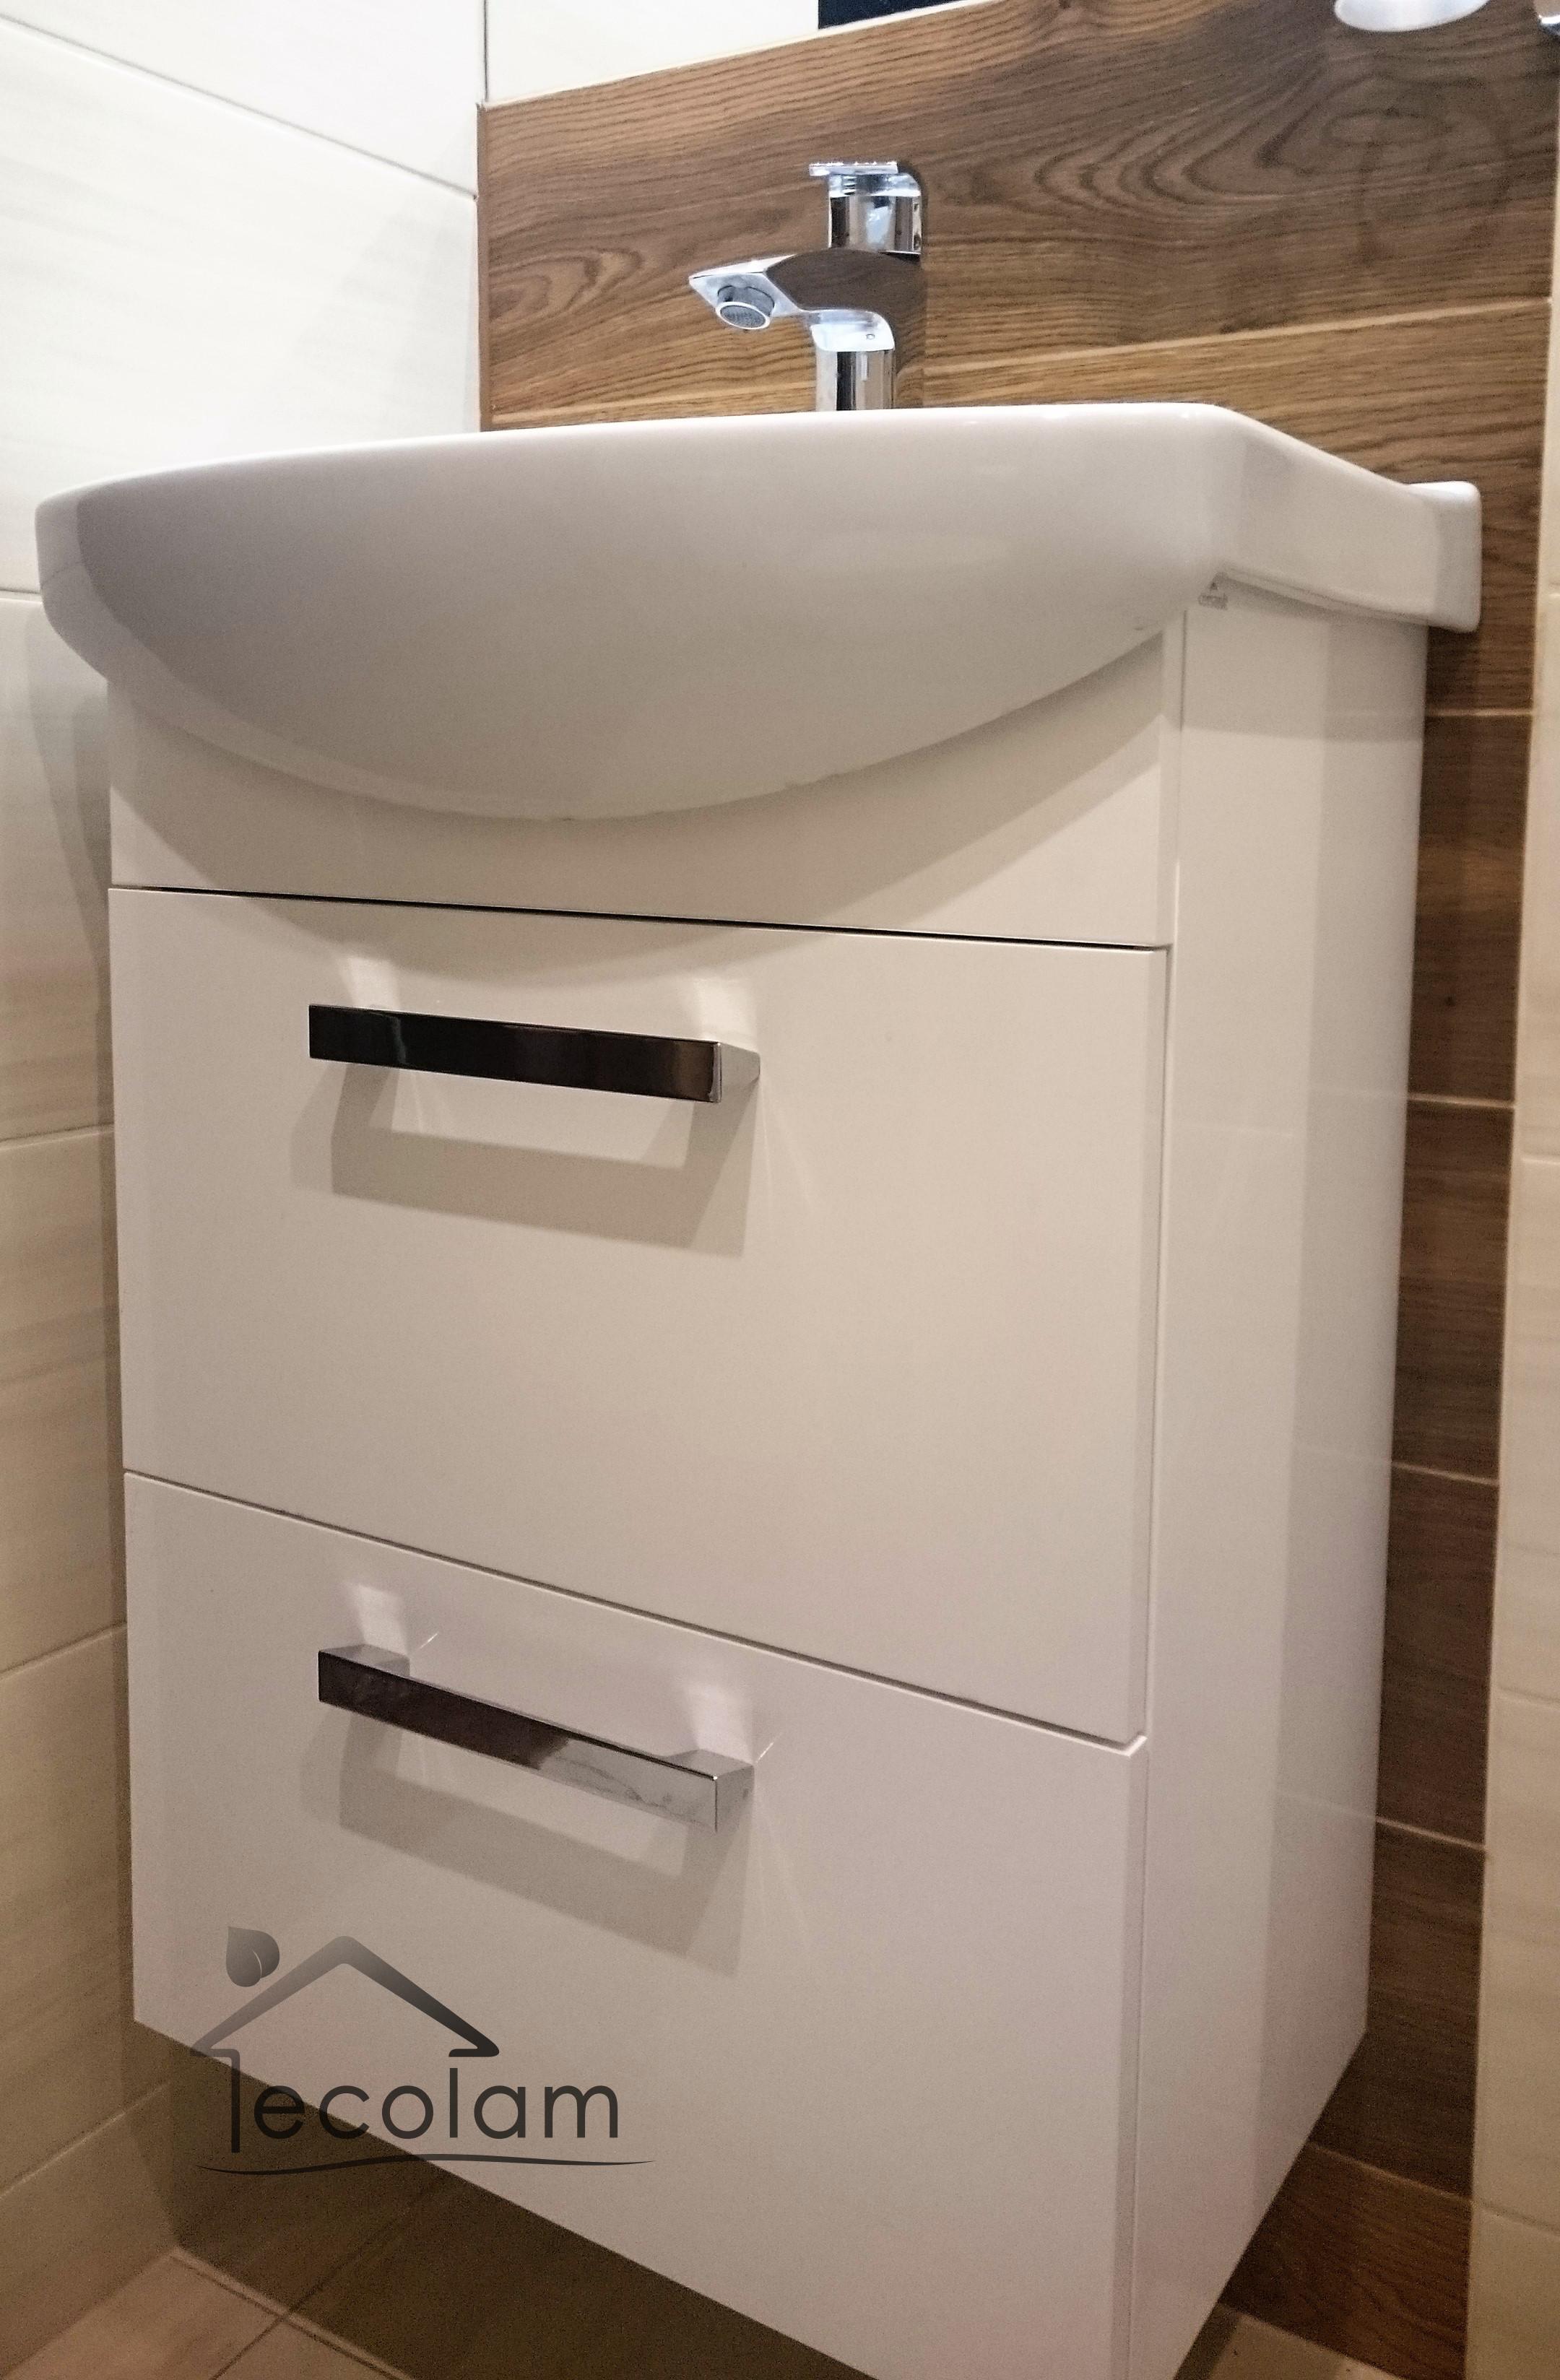 badm bel waschbecken 60 h ngend unterschrank schubladen siphon click clack m c ebay. Black Bedroom Furniture Sets. Home Design Ideas